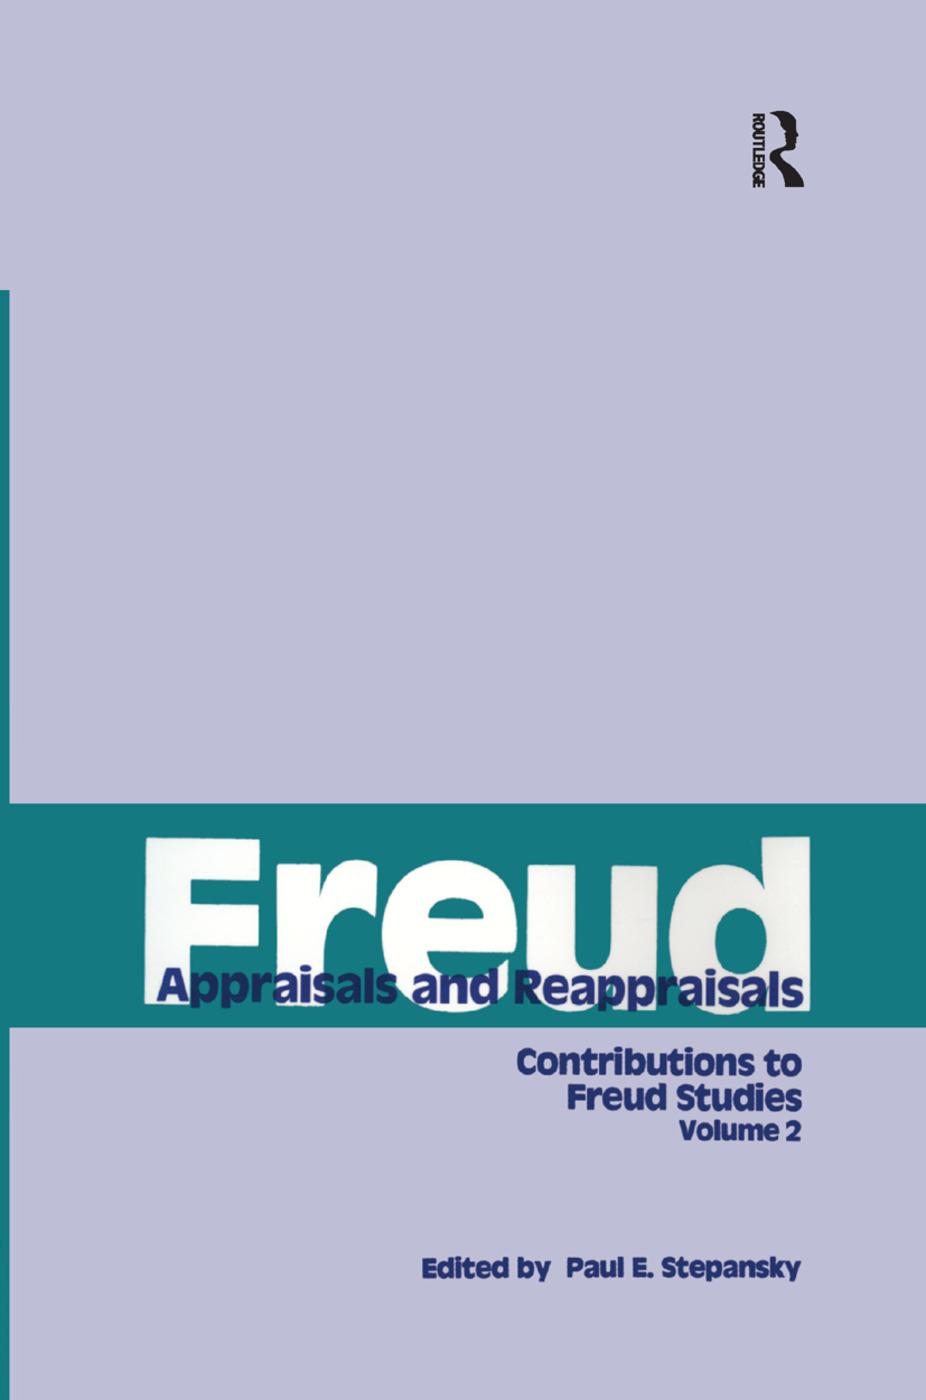 Freud, V. 2